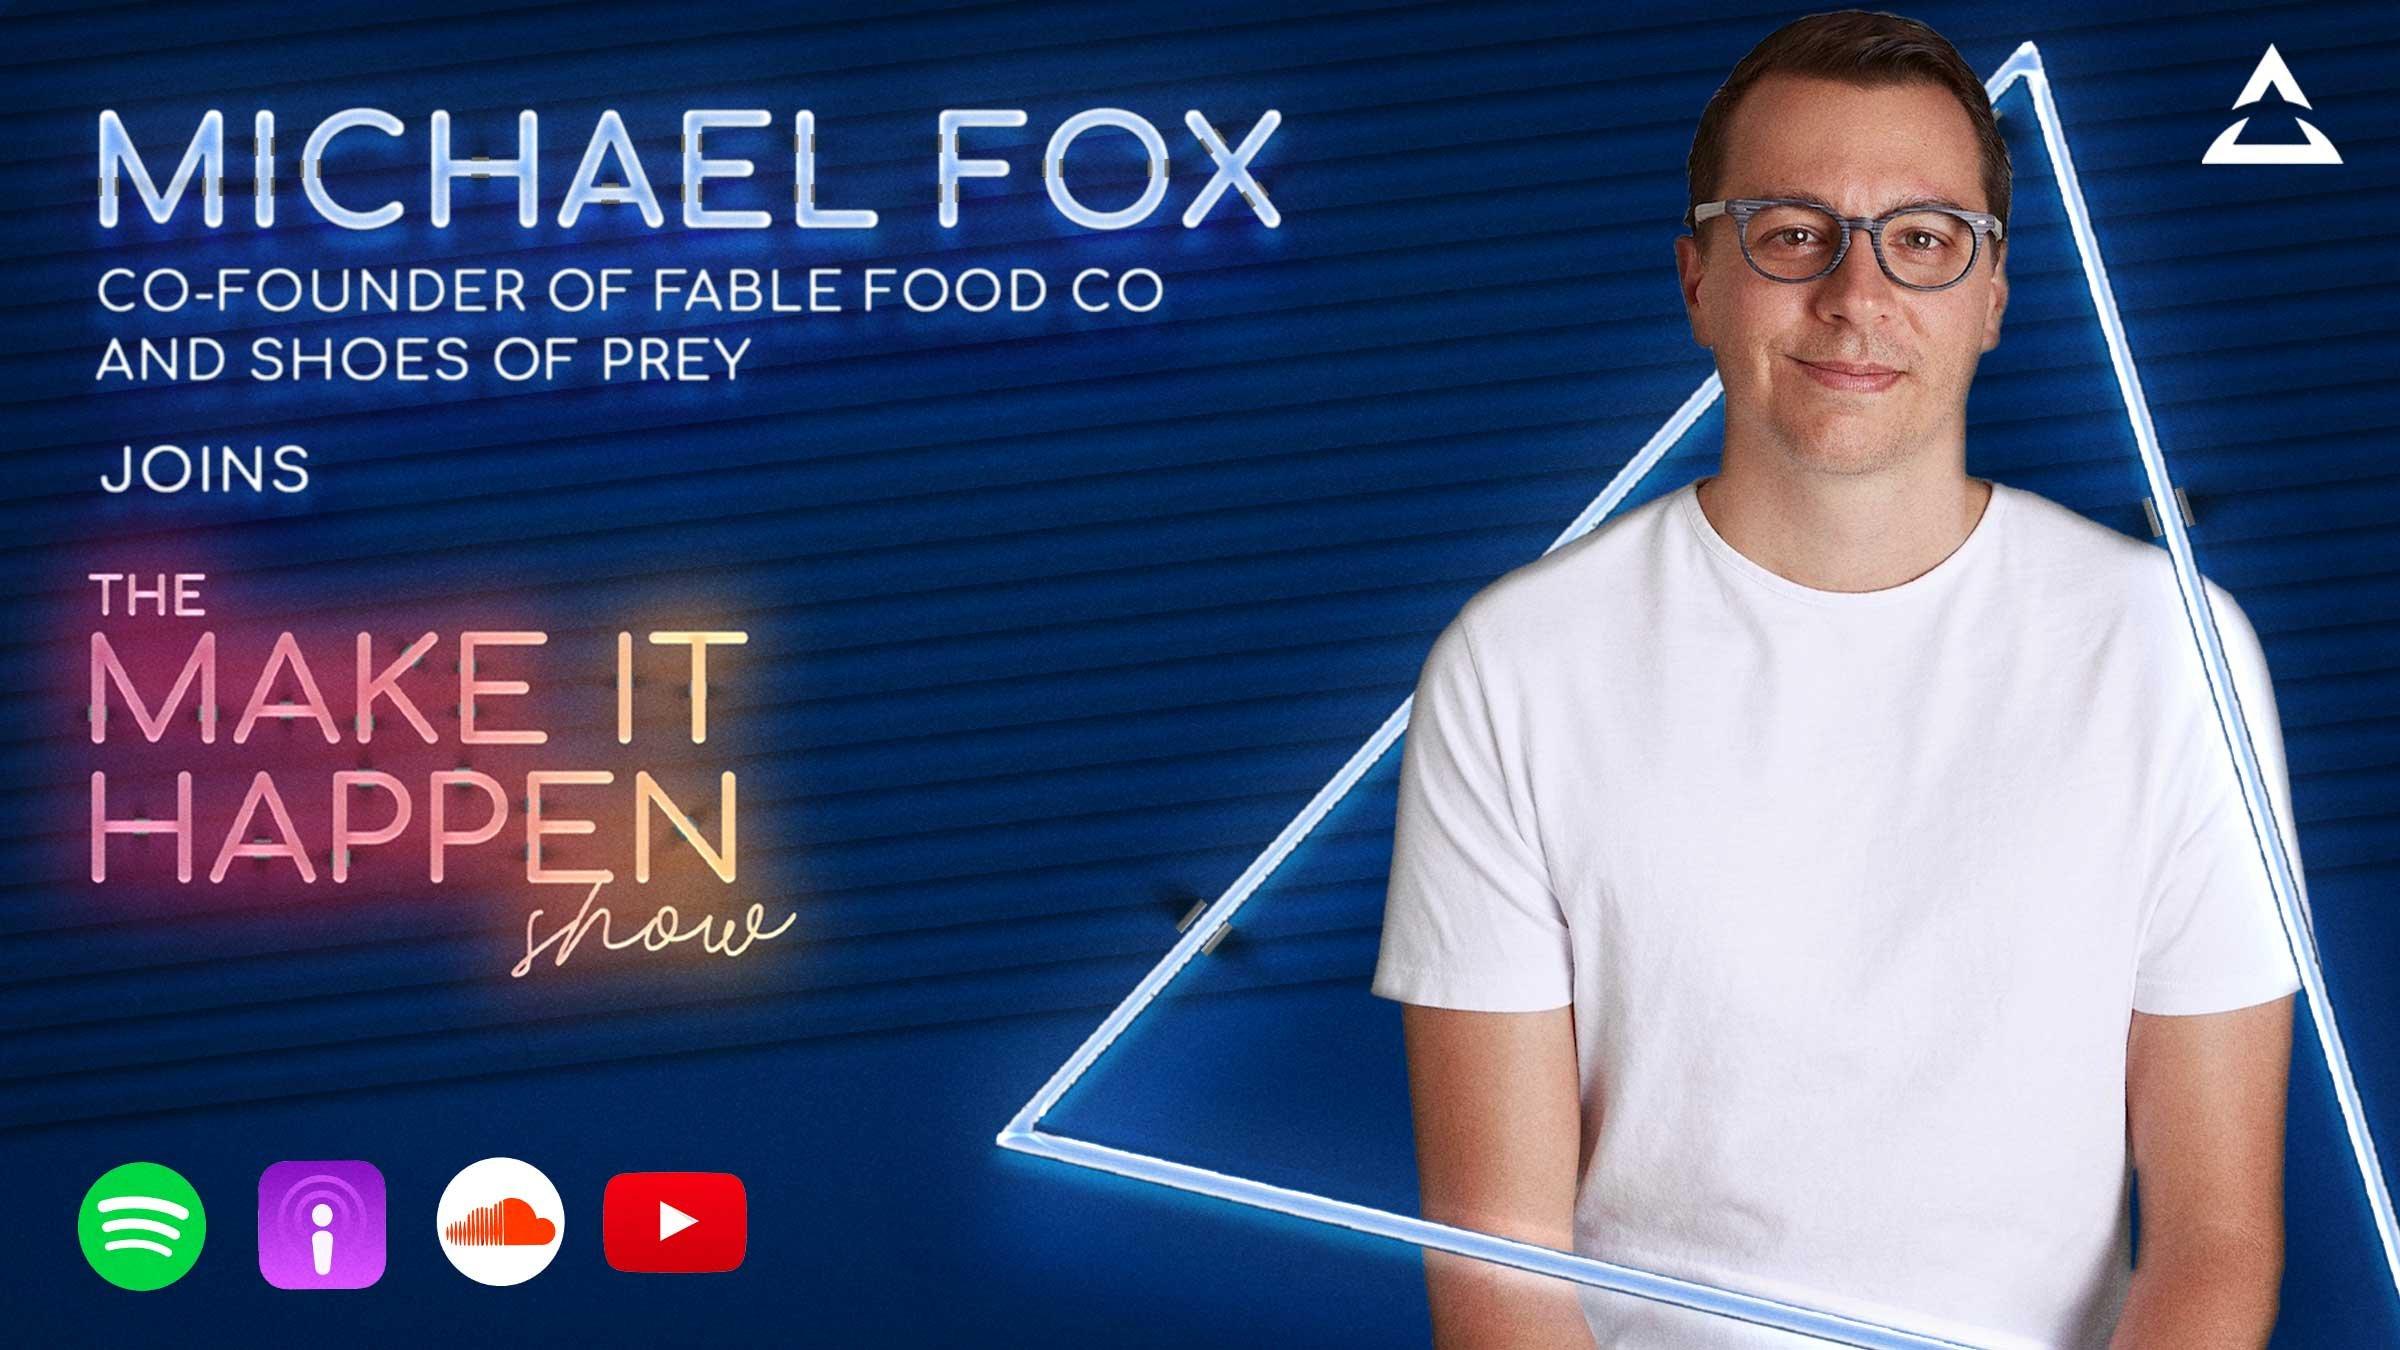 Michael Fox featured image